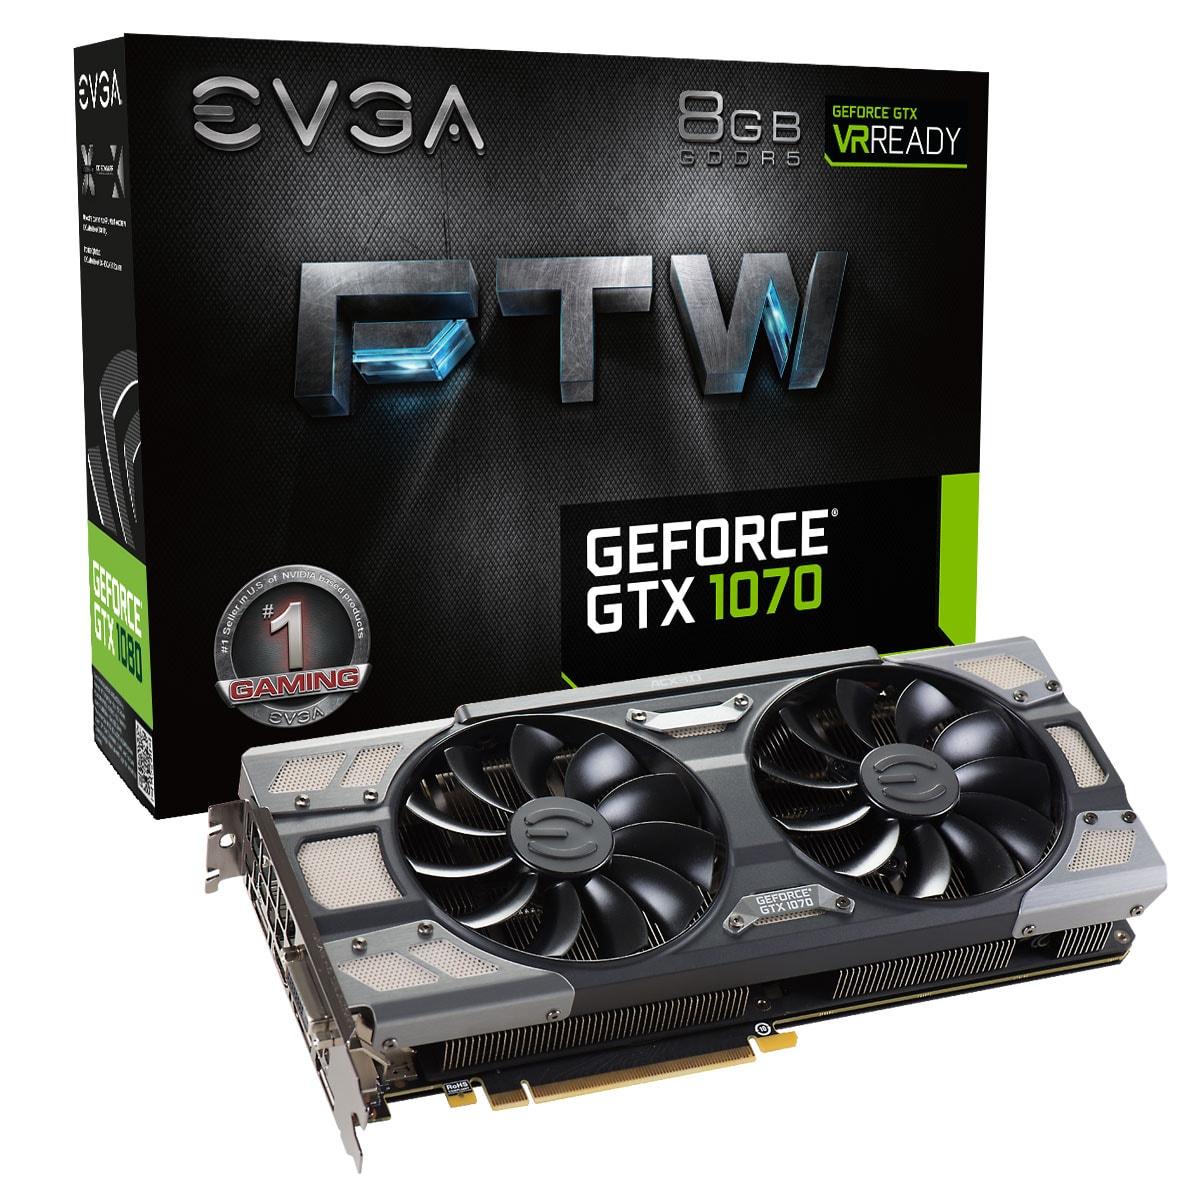 EVGA GTX 1070 FTW Gaming 8Go - Carte graphique EVGA - Cybertek.fr - 0